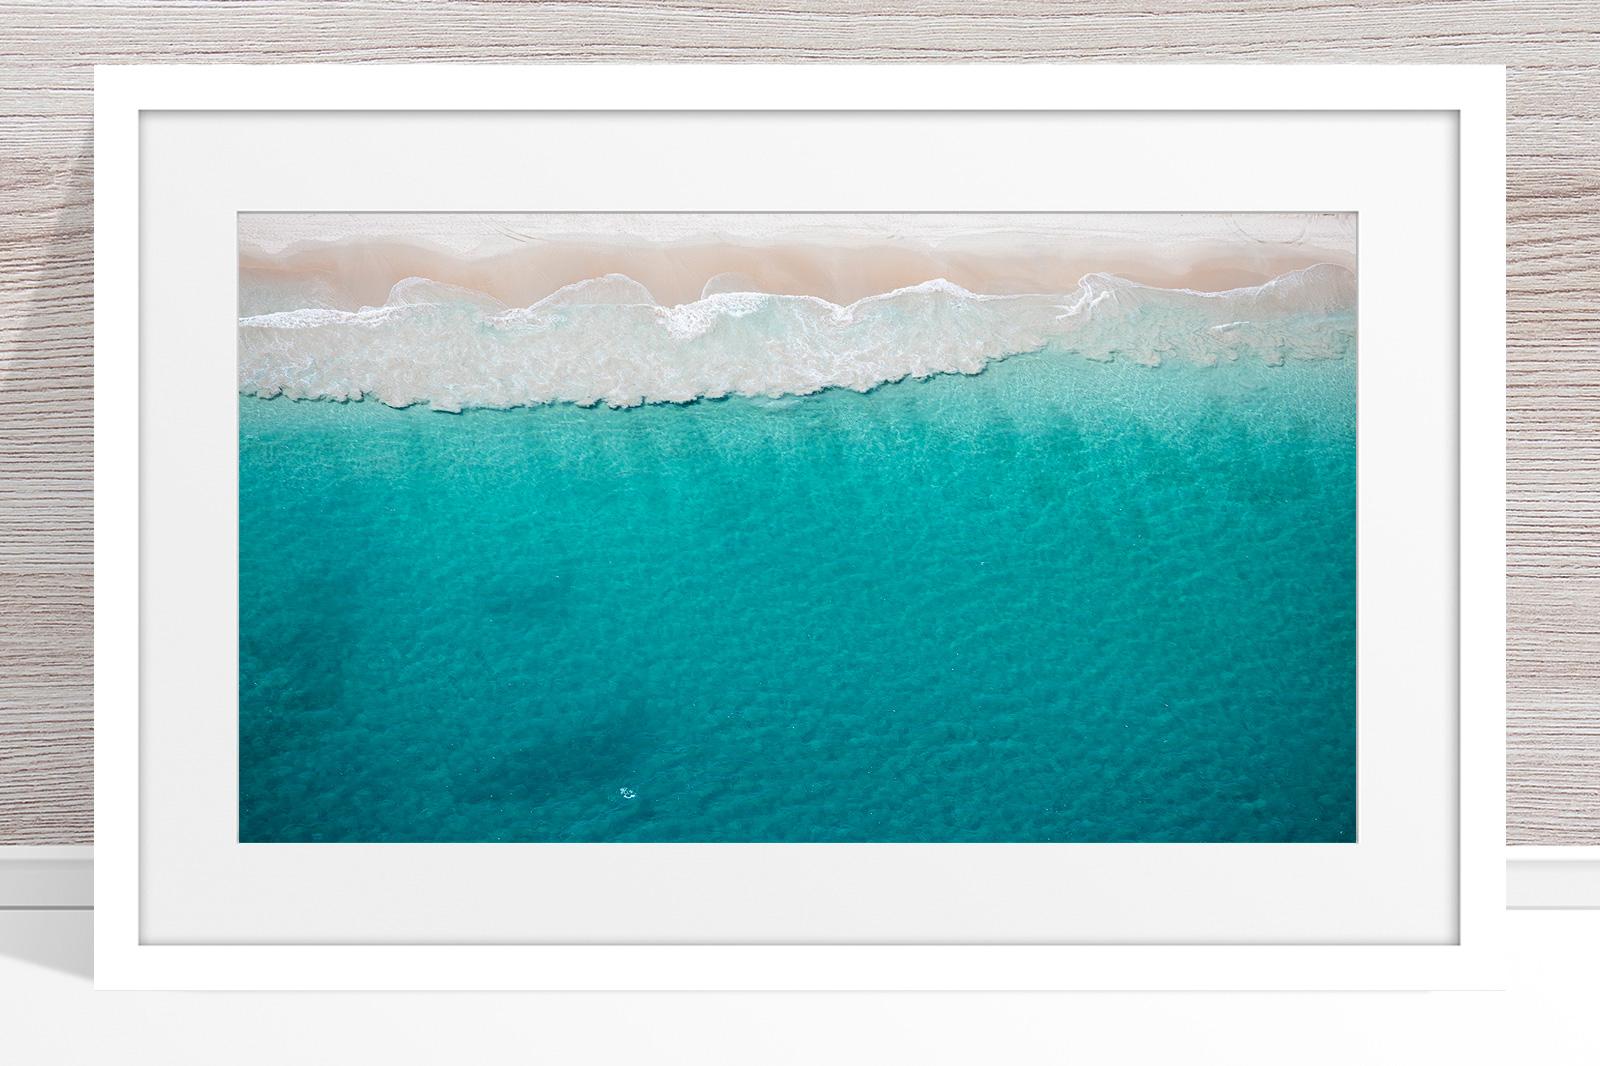 034 - Jason Mazur - 'North Beach Aerial' White Frame